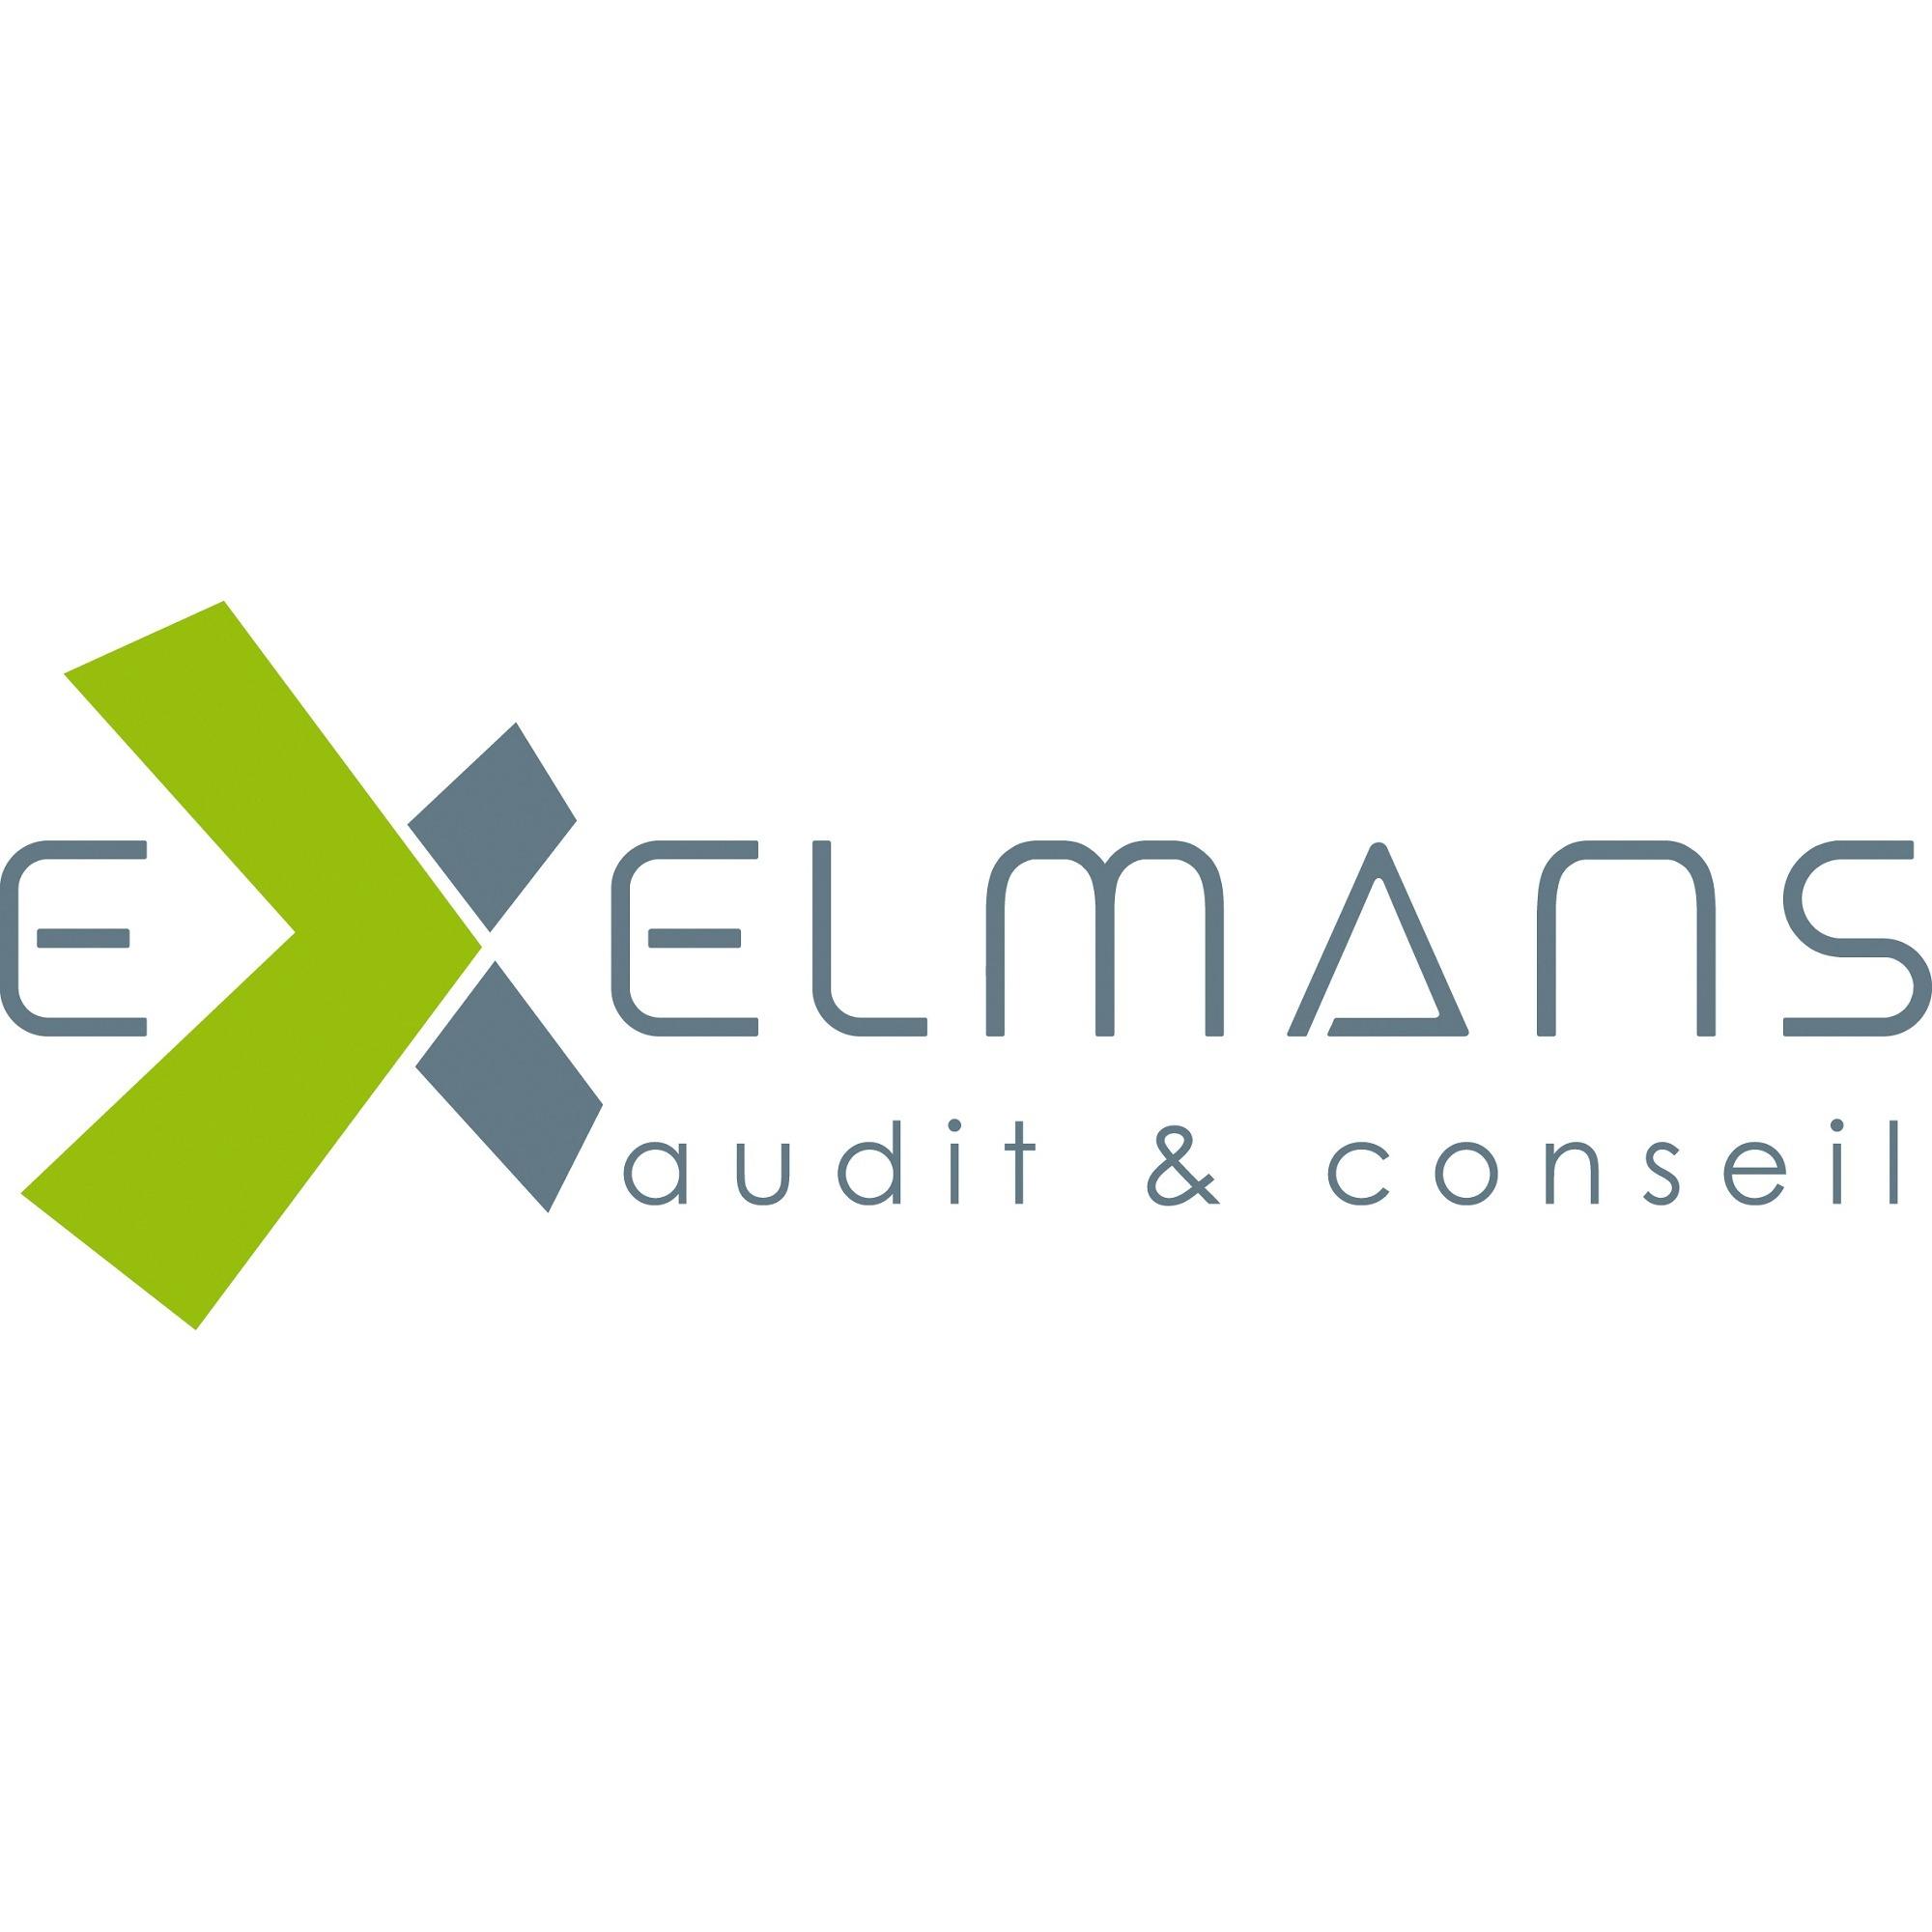 the Exelmans Audit & Conseil logo.